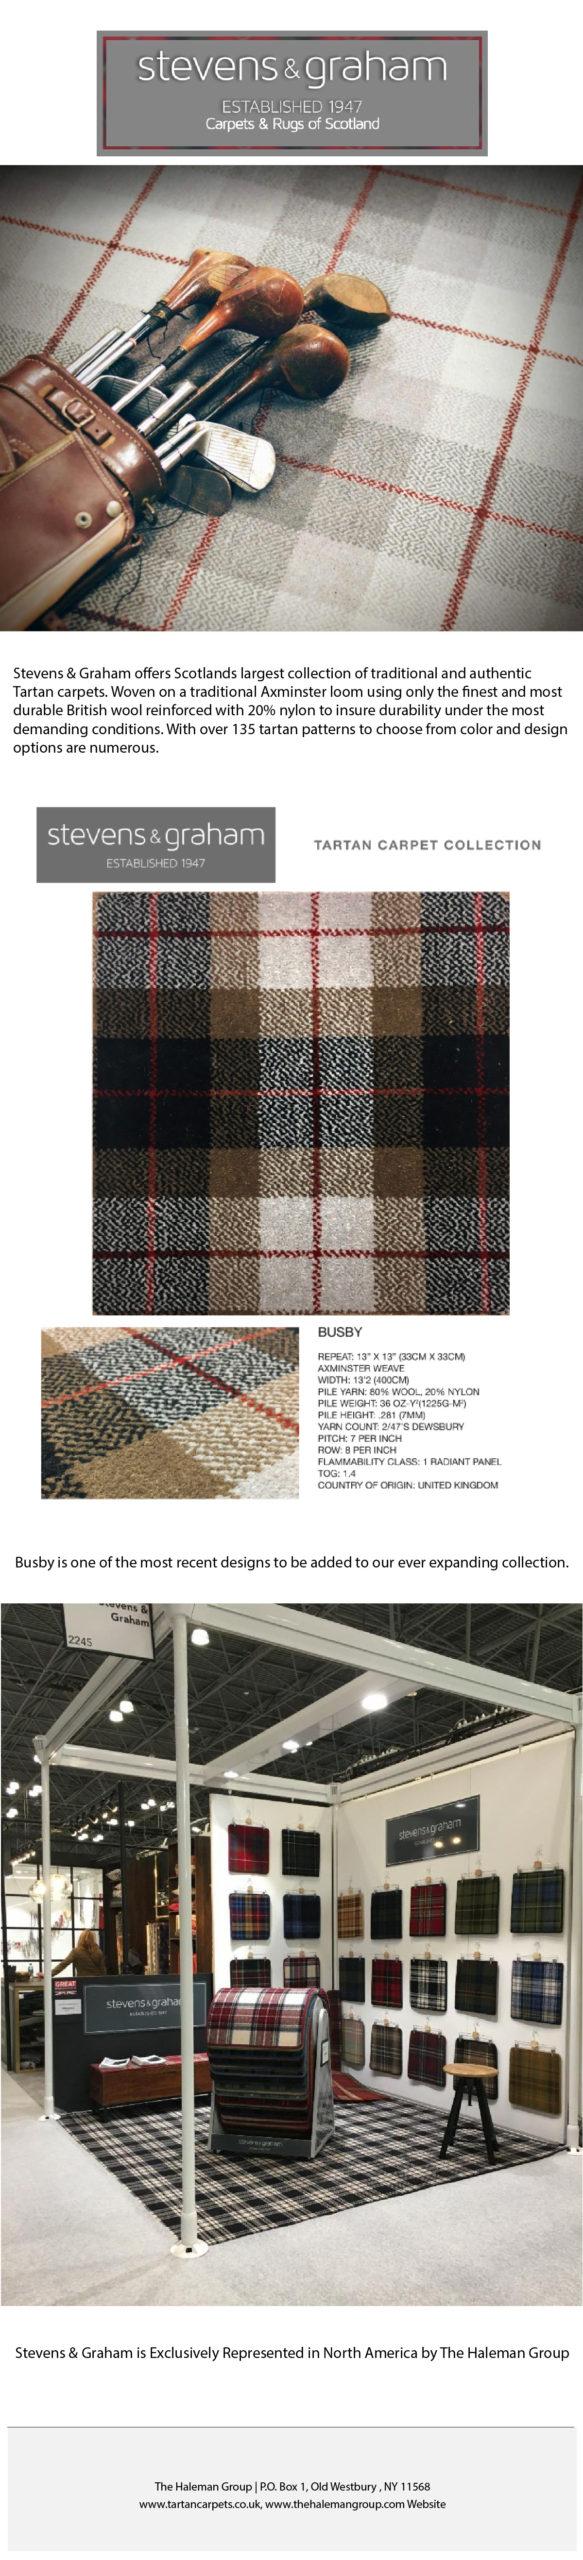 Tartan rug and carpet images